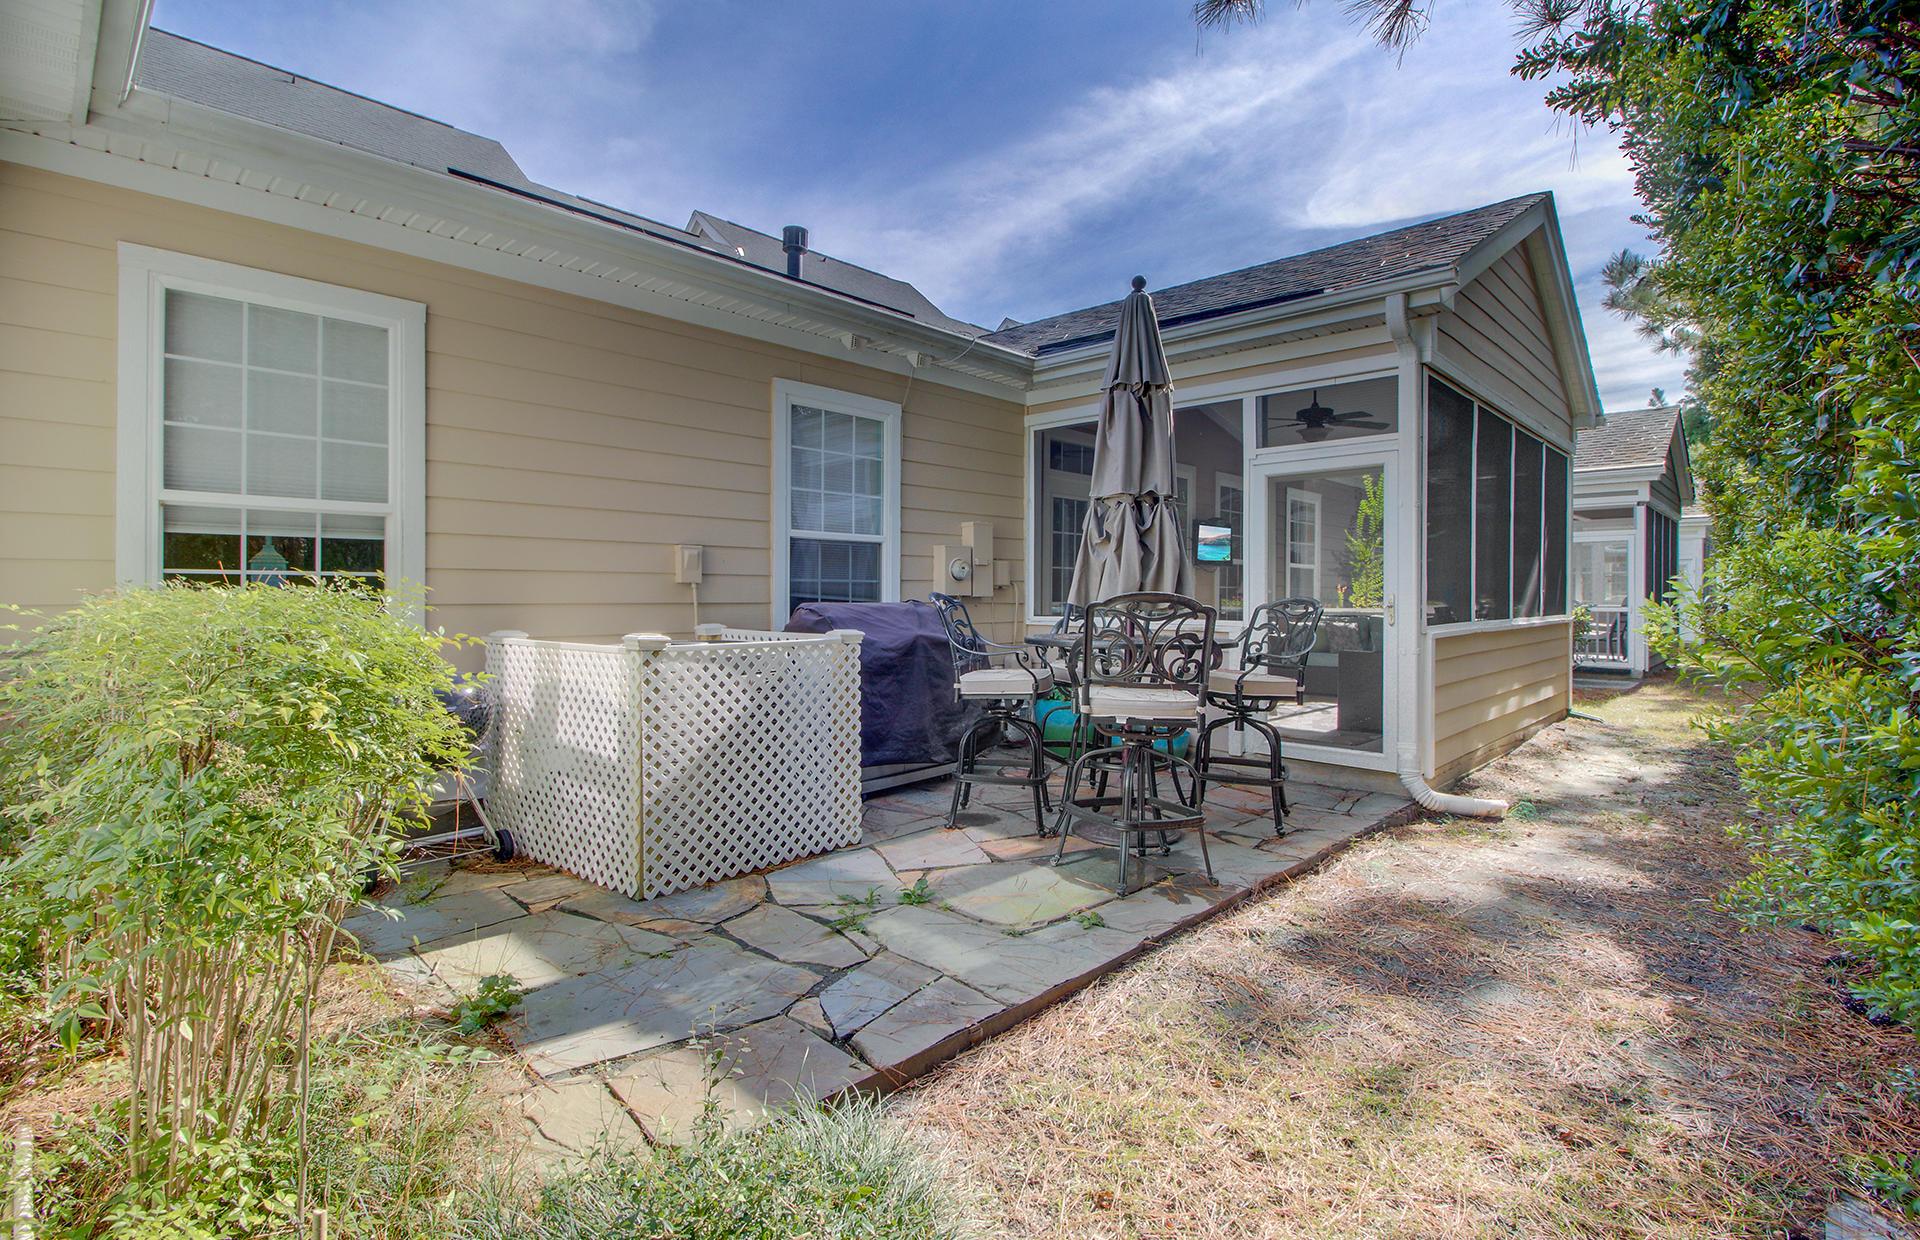 Dunes West Homes For Sale - 145 Fresh Meadow, Mount Pleasant, SC - 35